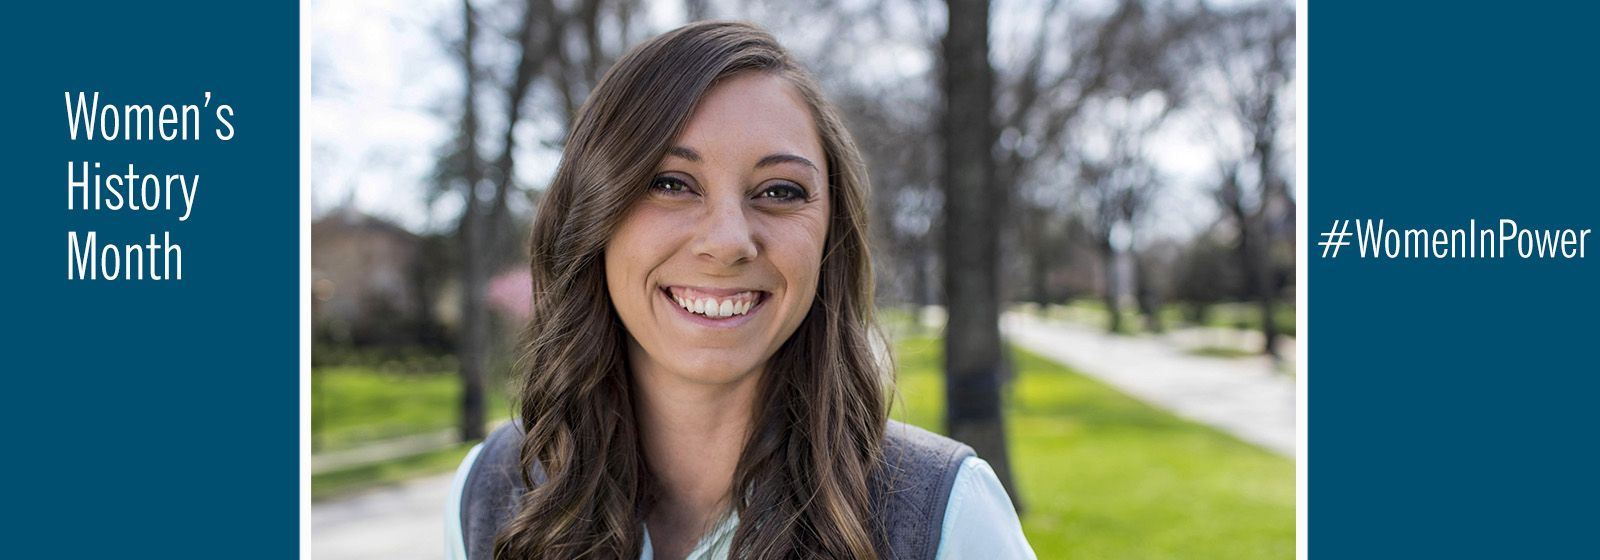 Meet Joie McCutchen, arborist